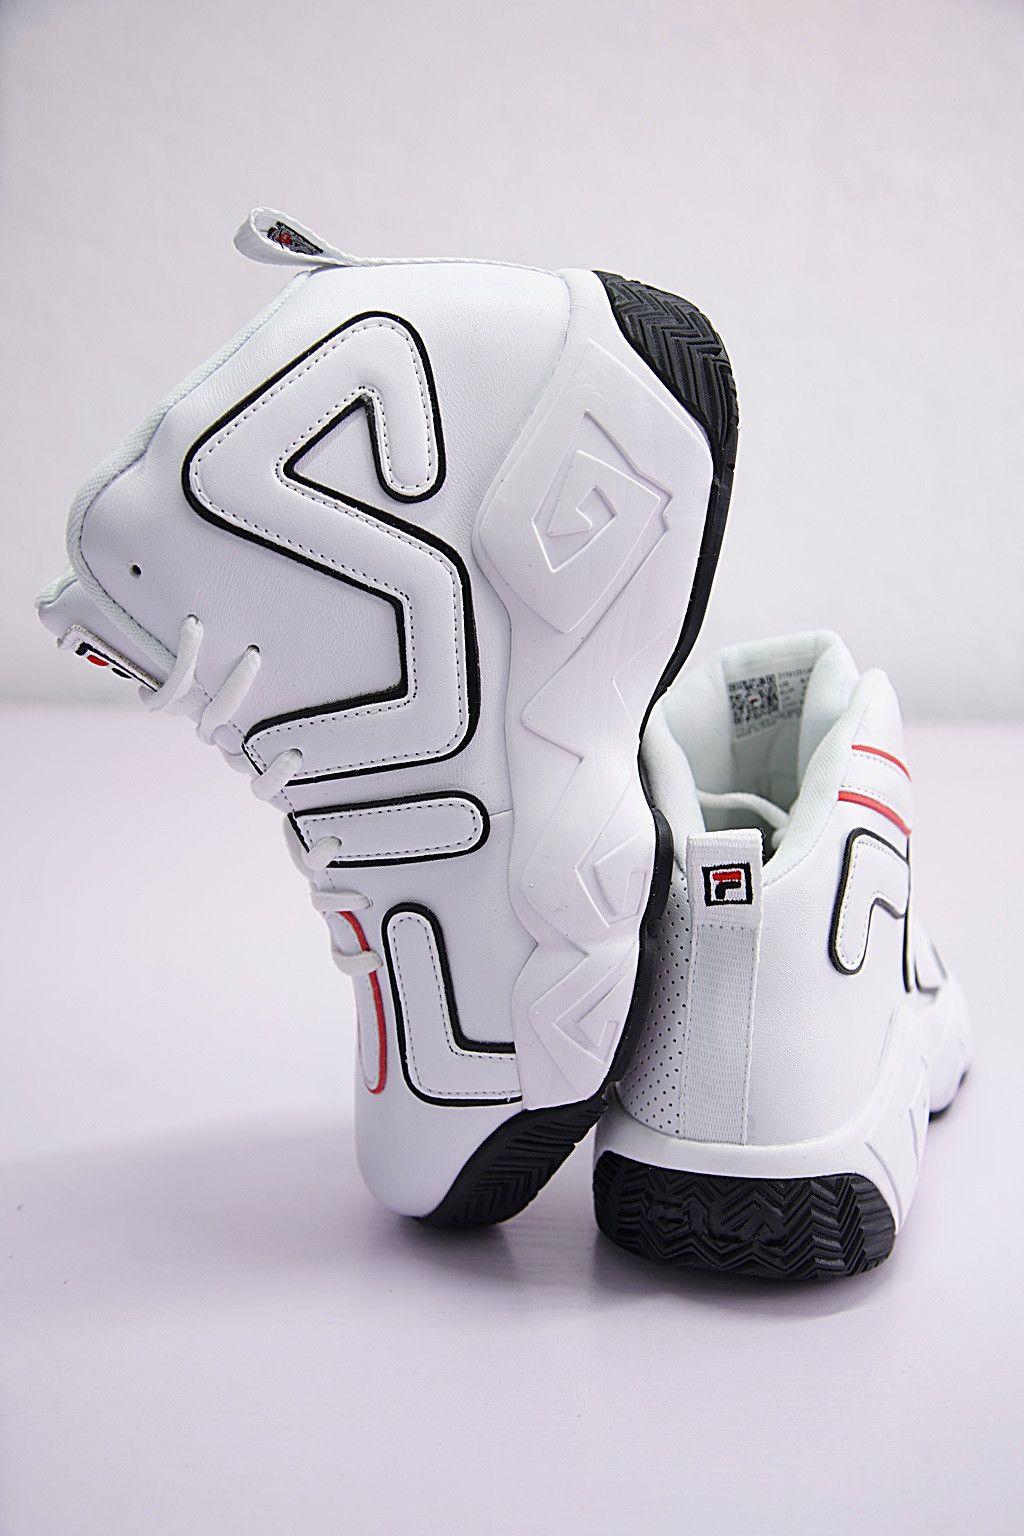 Fila Jamal Mashburn Mb1 F1xkw120148 White Shoes Black women